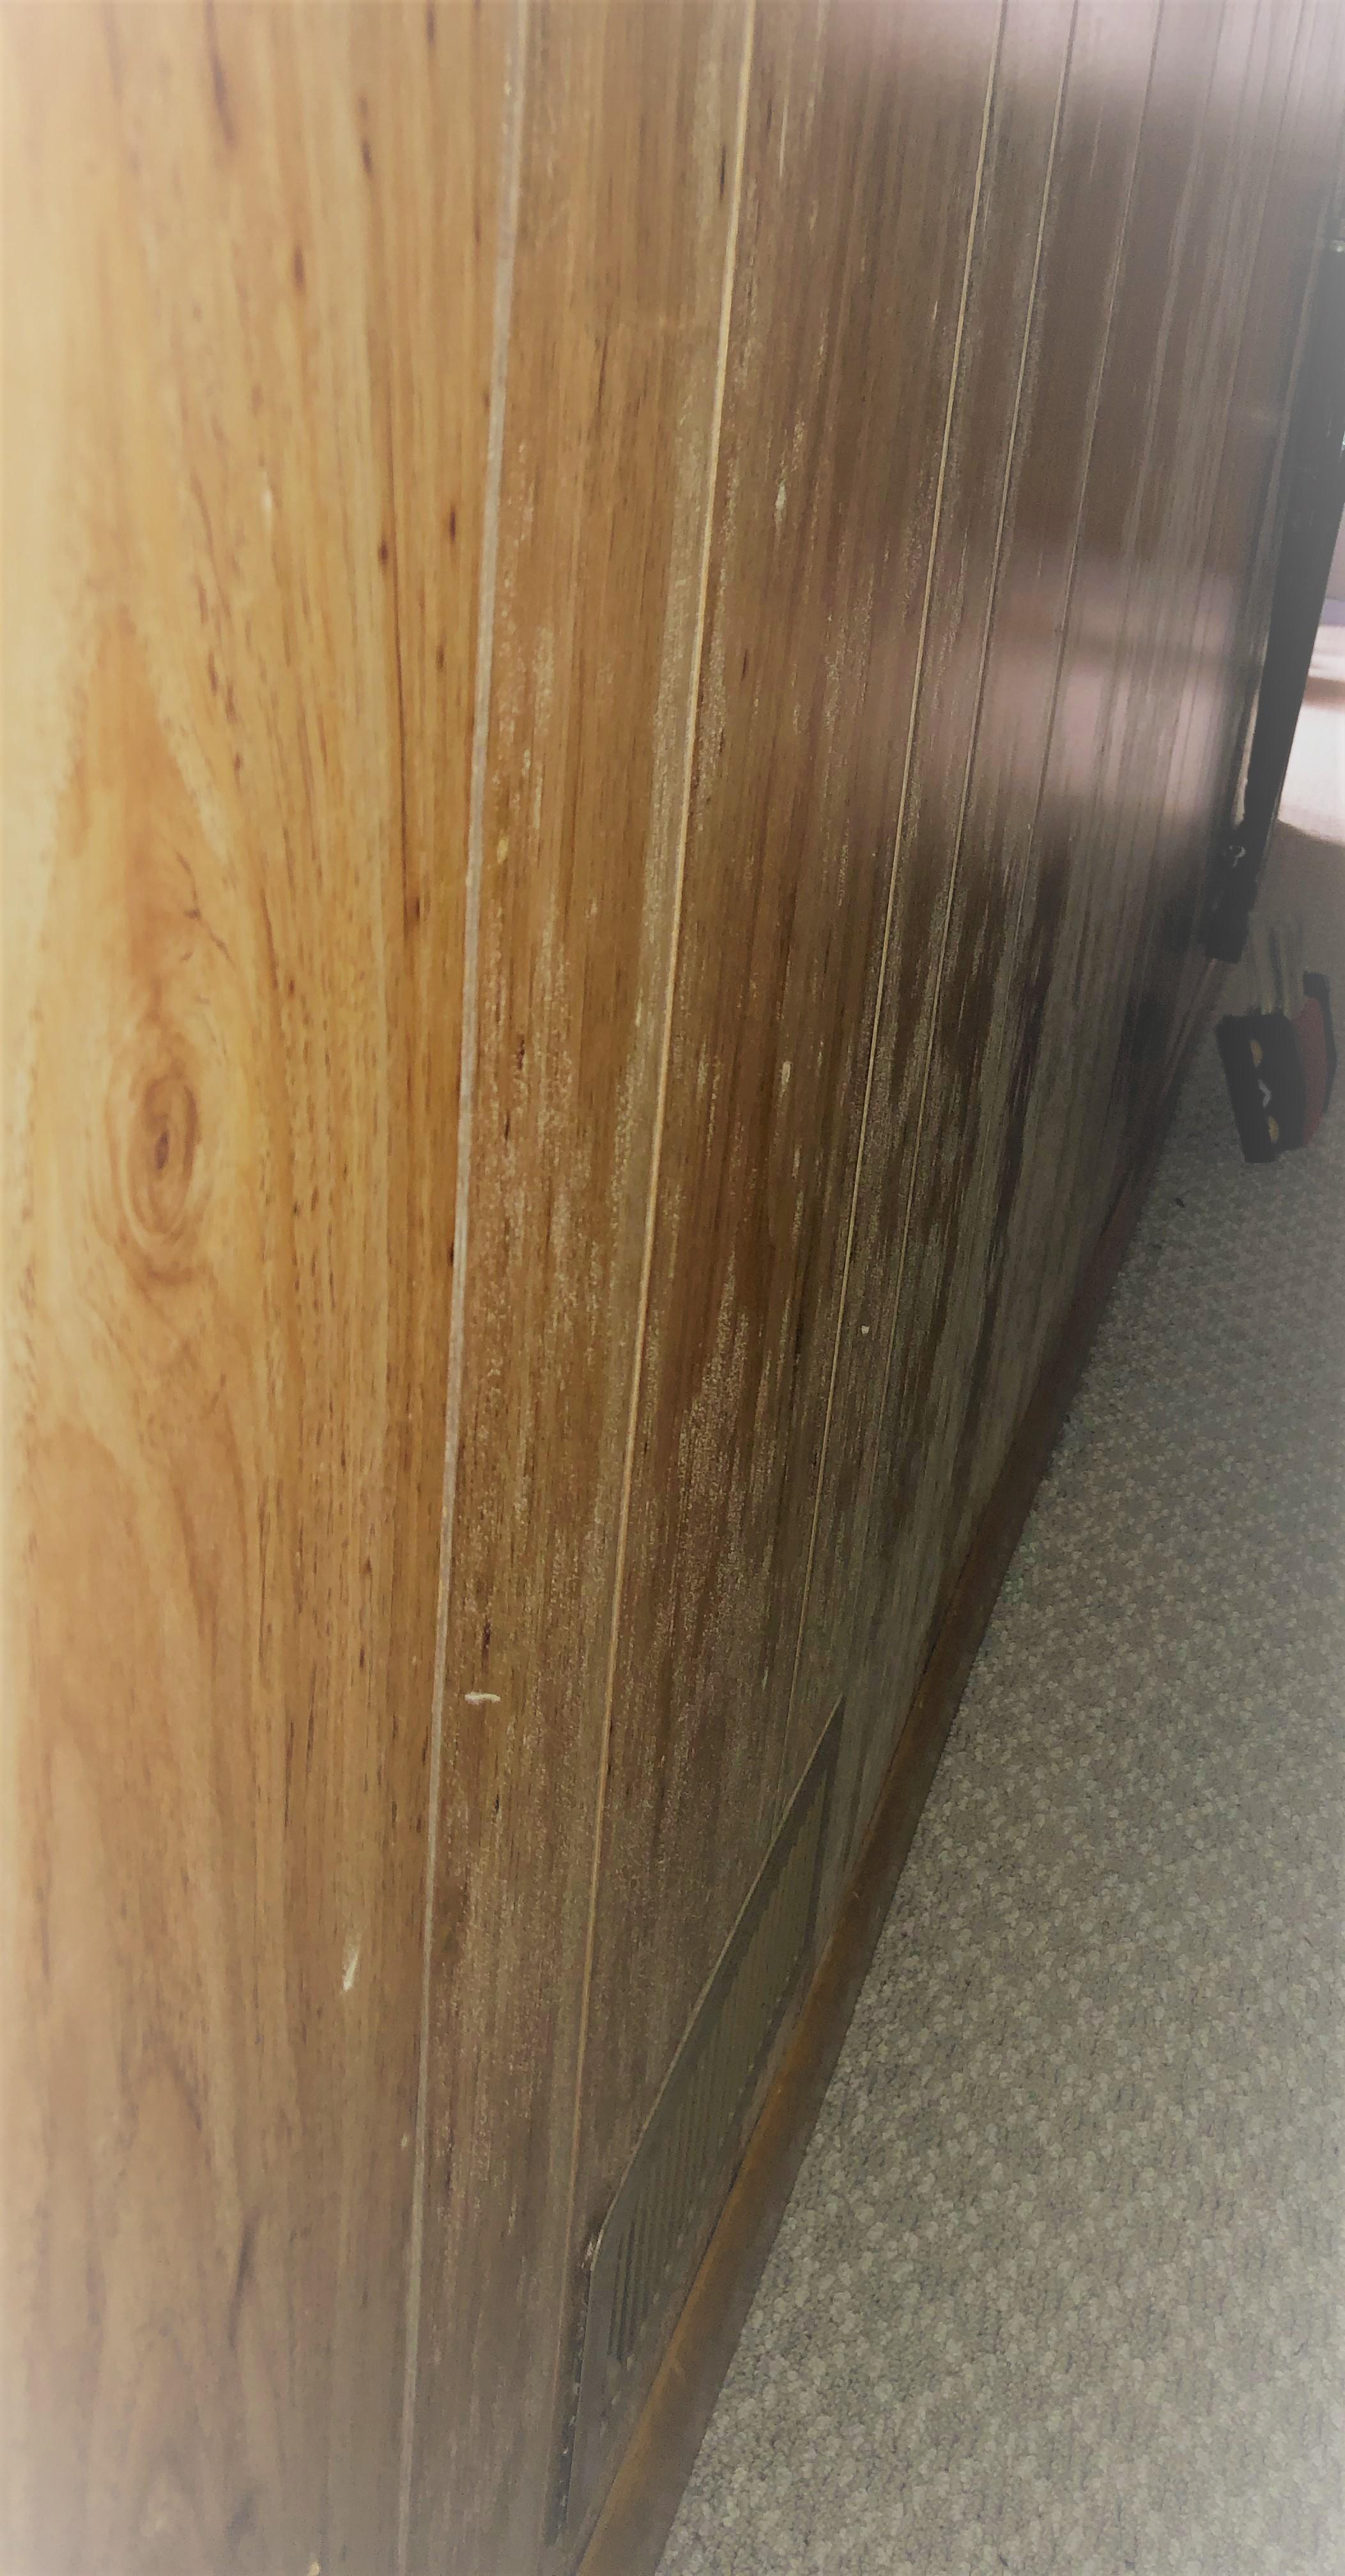 Mold growth on wood paneling